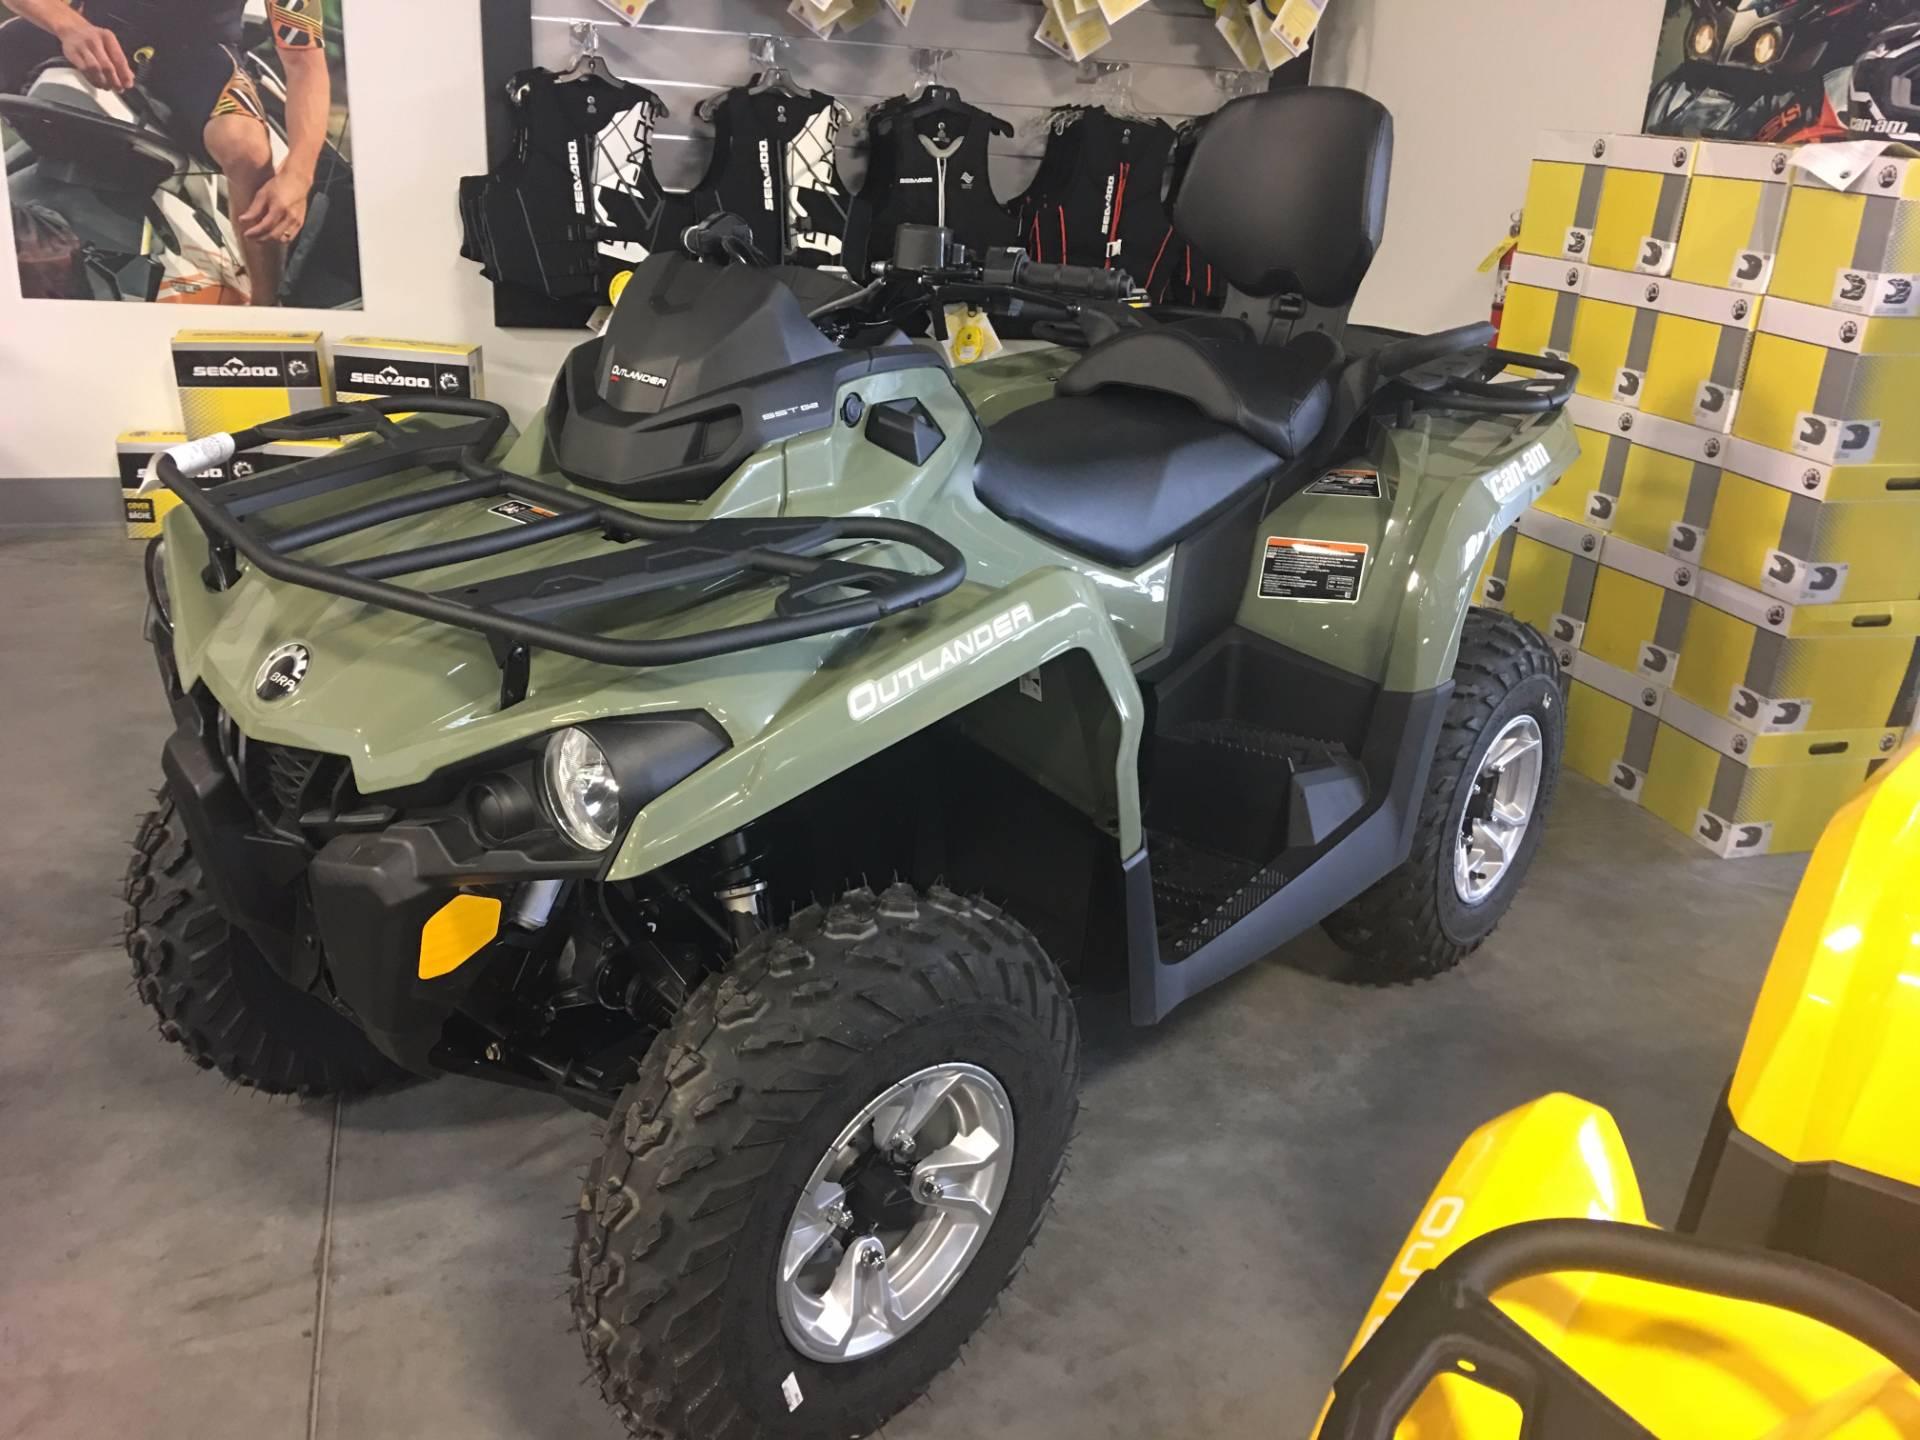 2017 Can-Am Outlander MAX DPS 570 in Las Vegas, Nevada